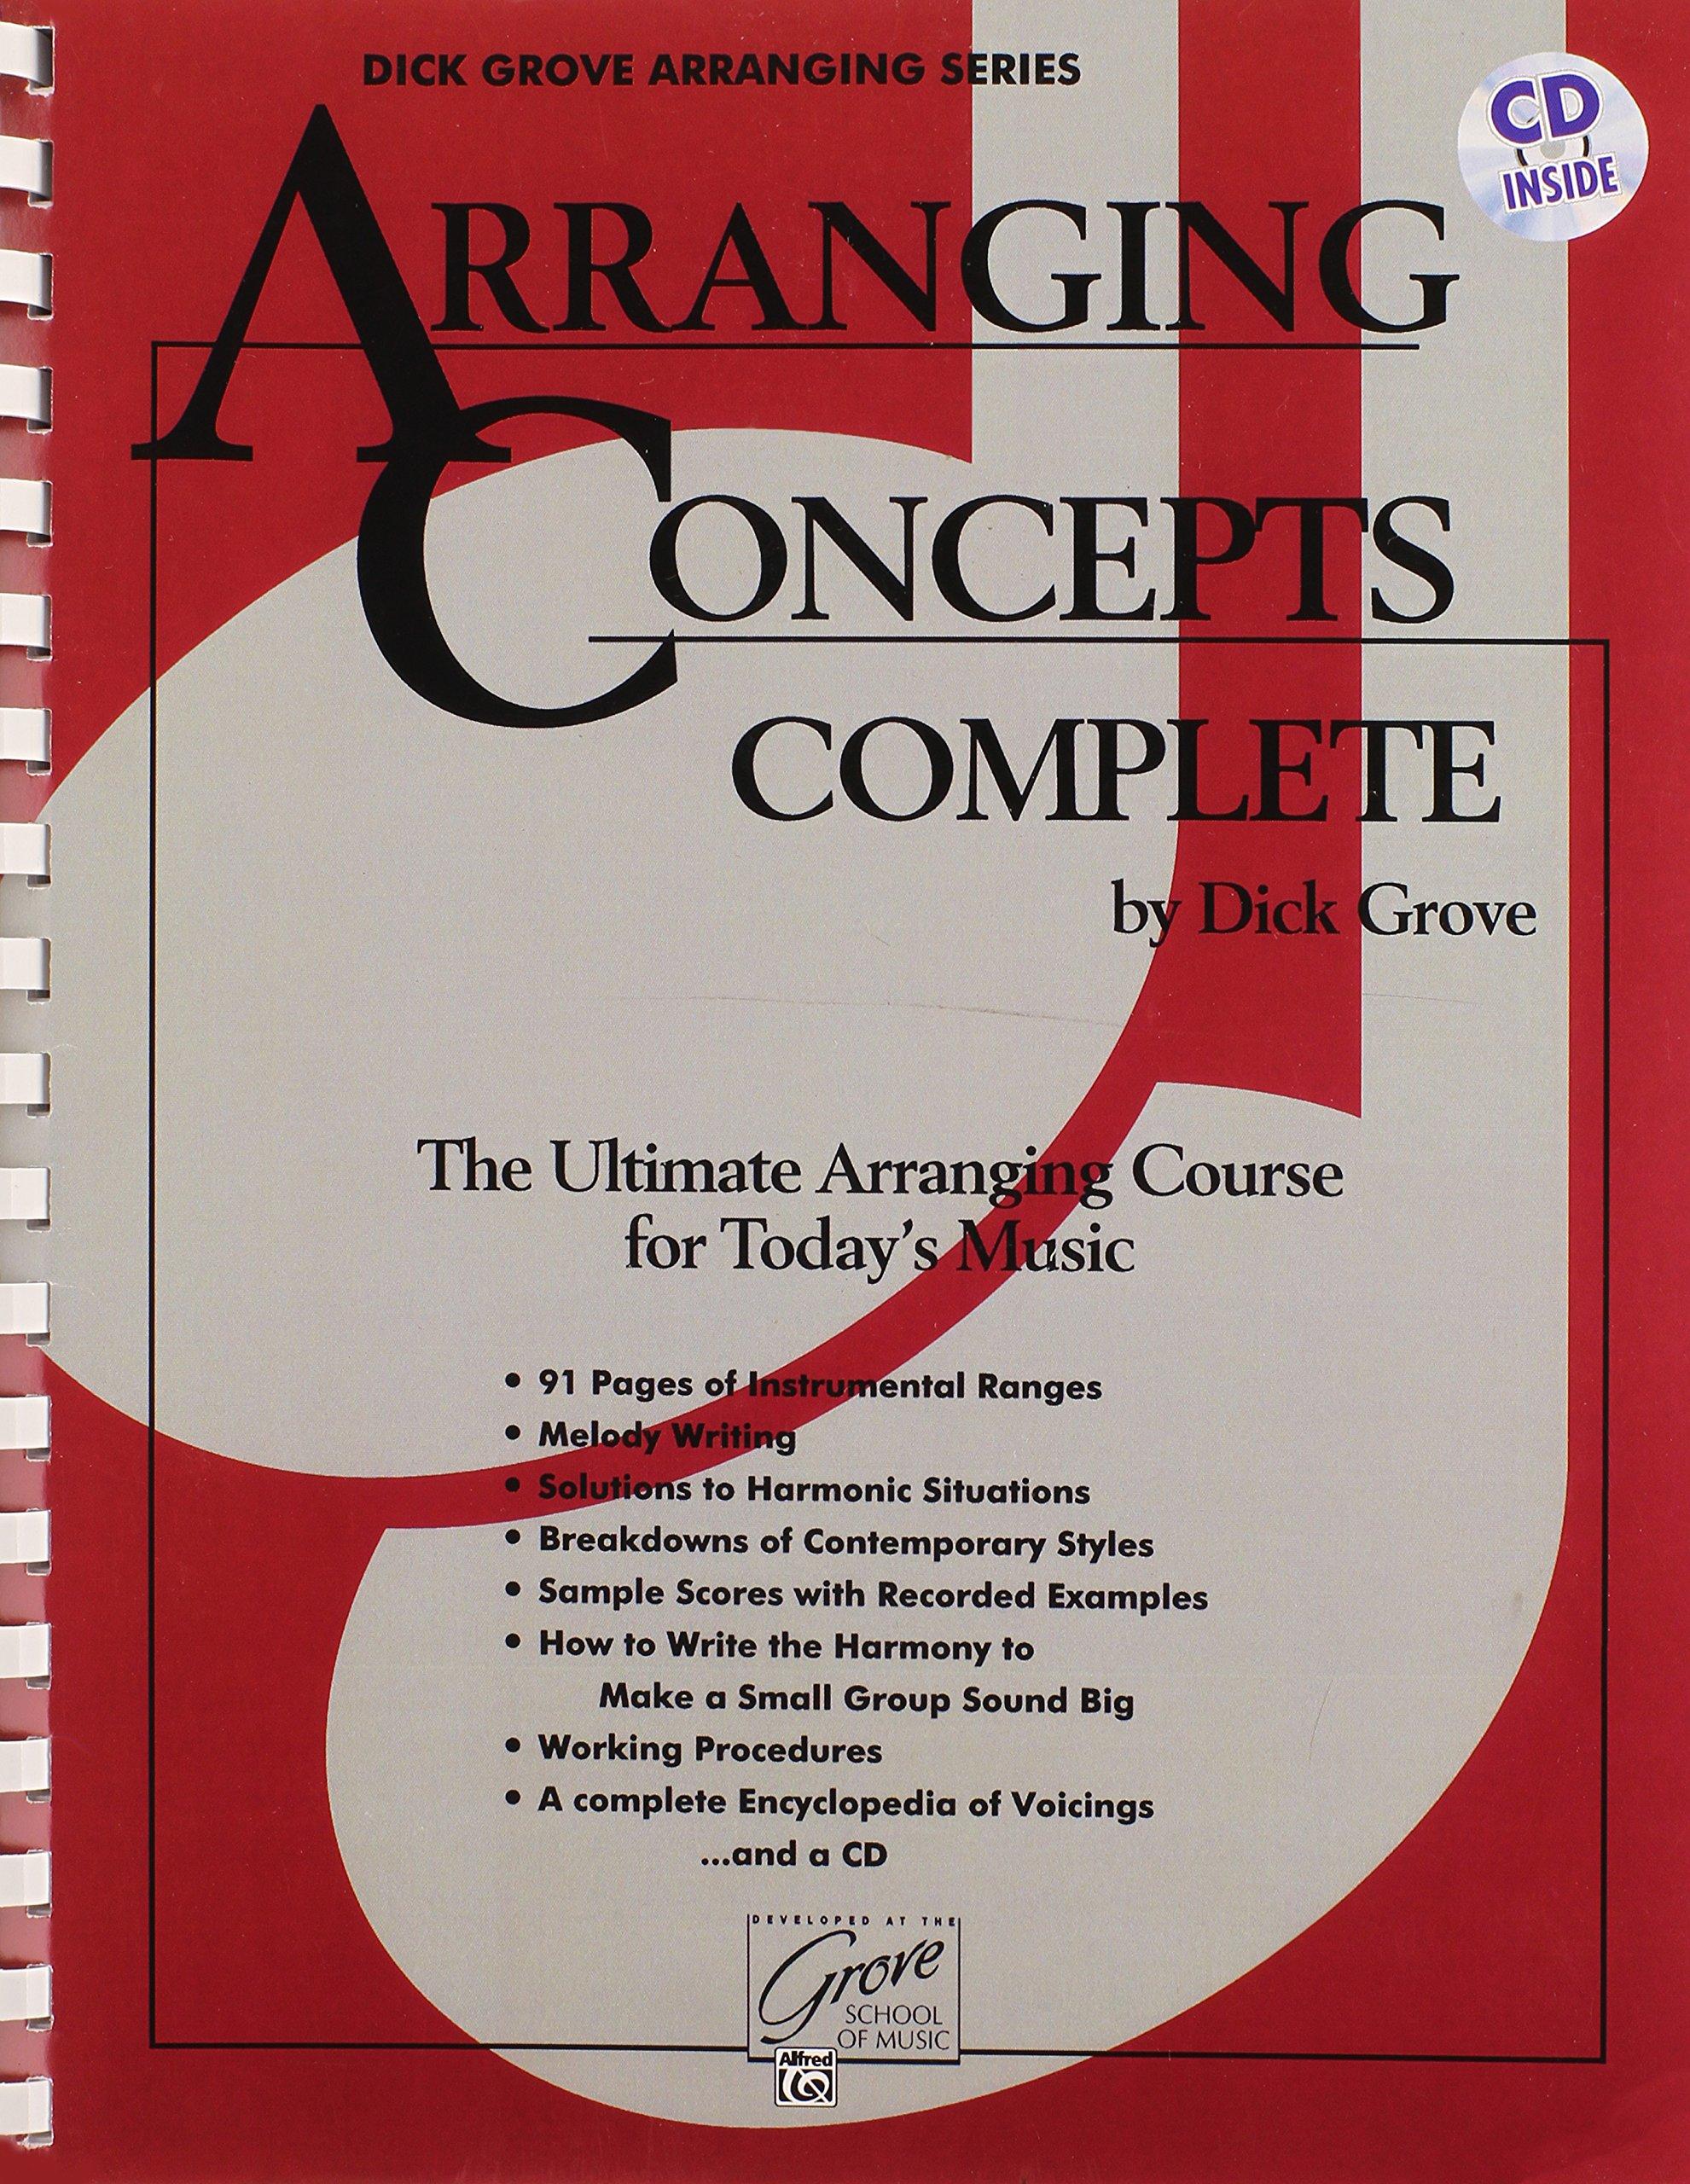 Arranging Concepts Complete